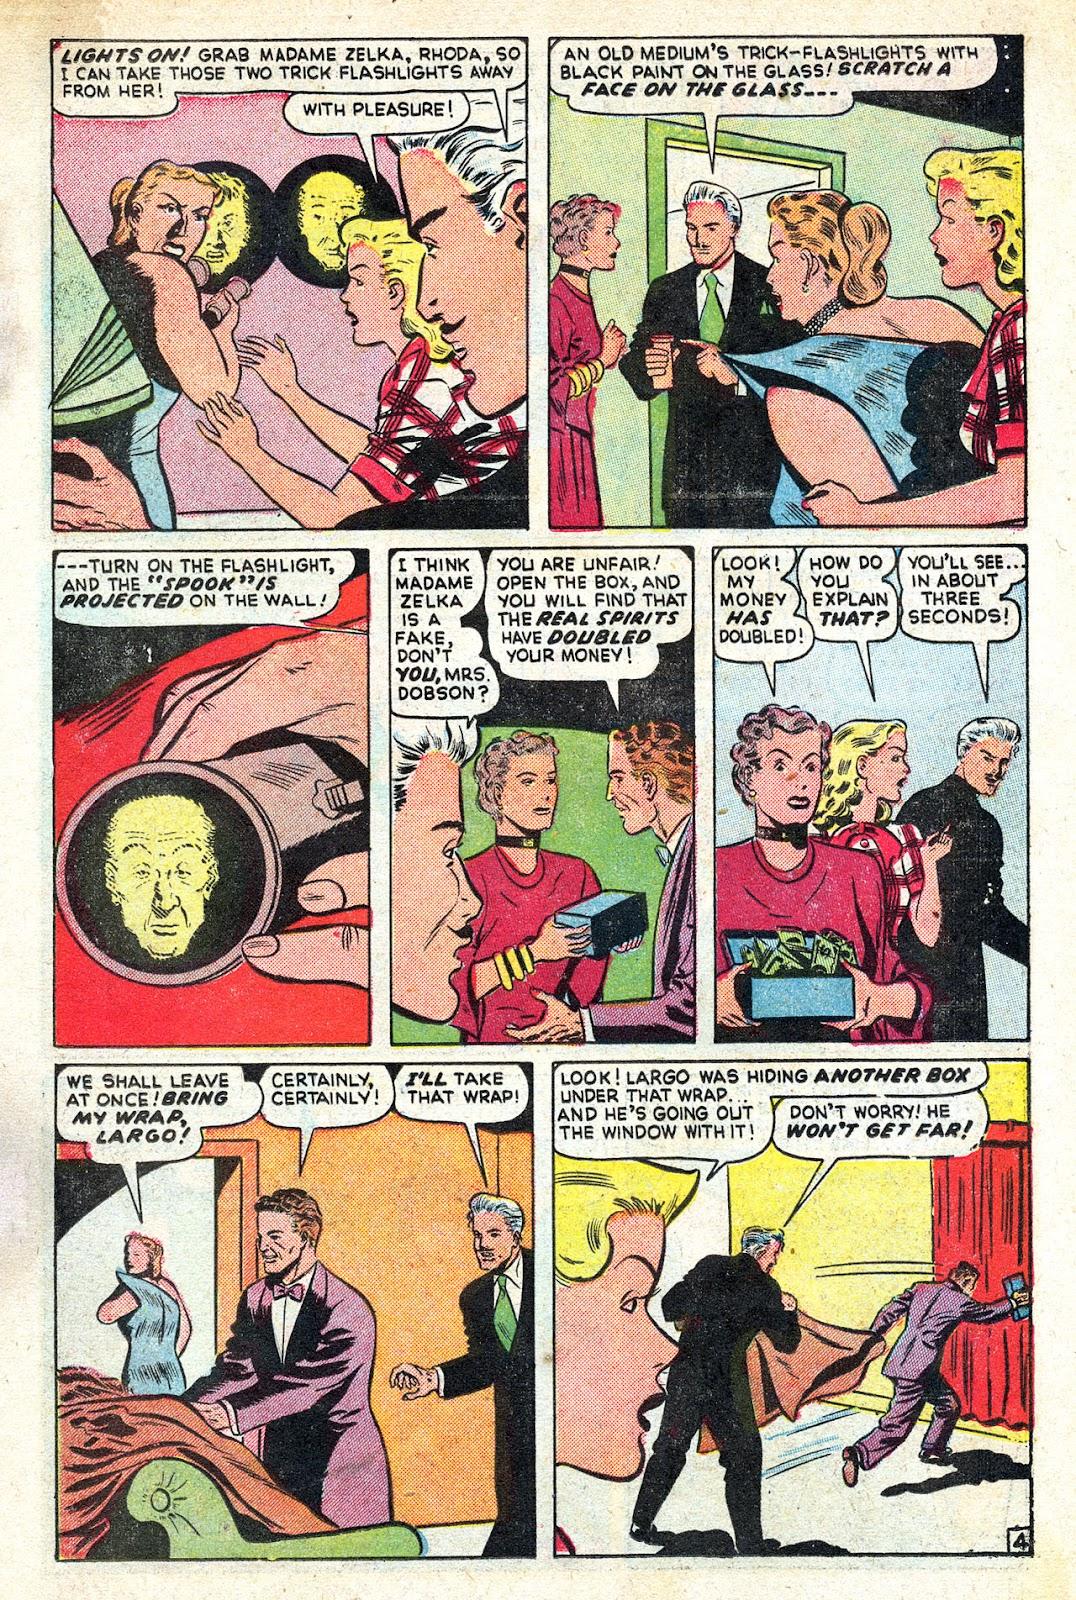 Read online Blackstone the Magician comic -  Issue #4 - 15